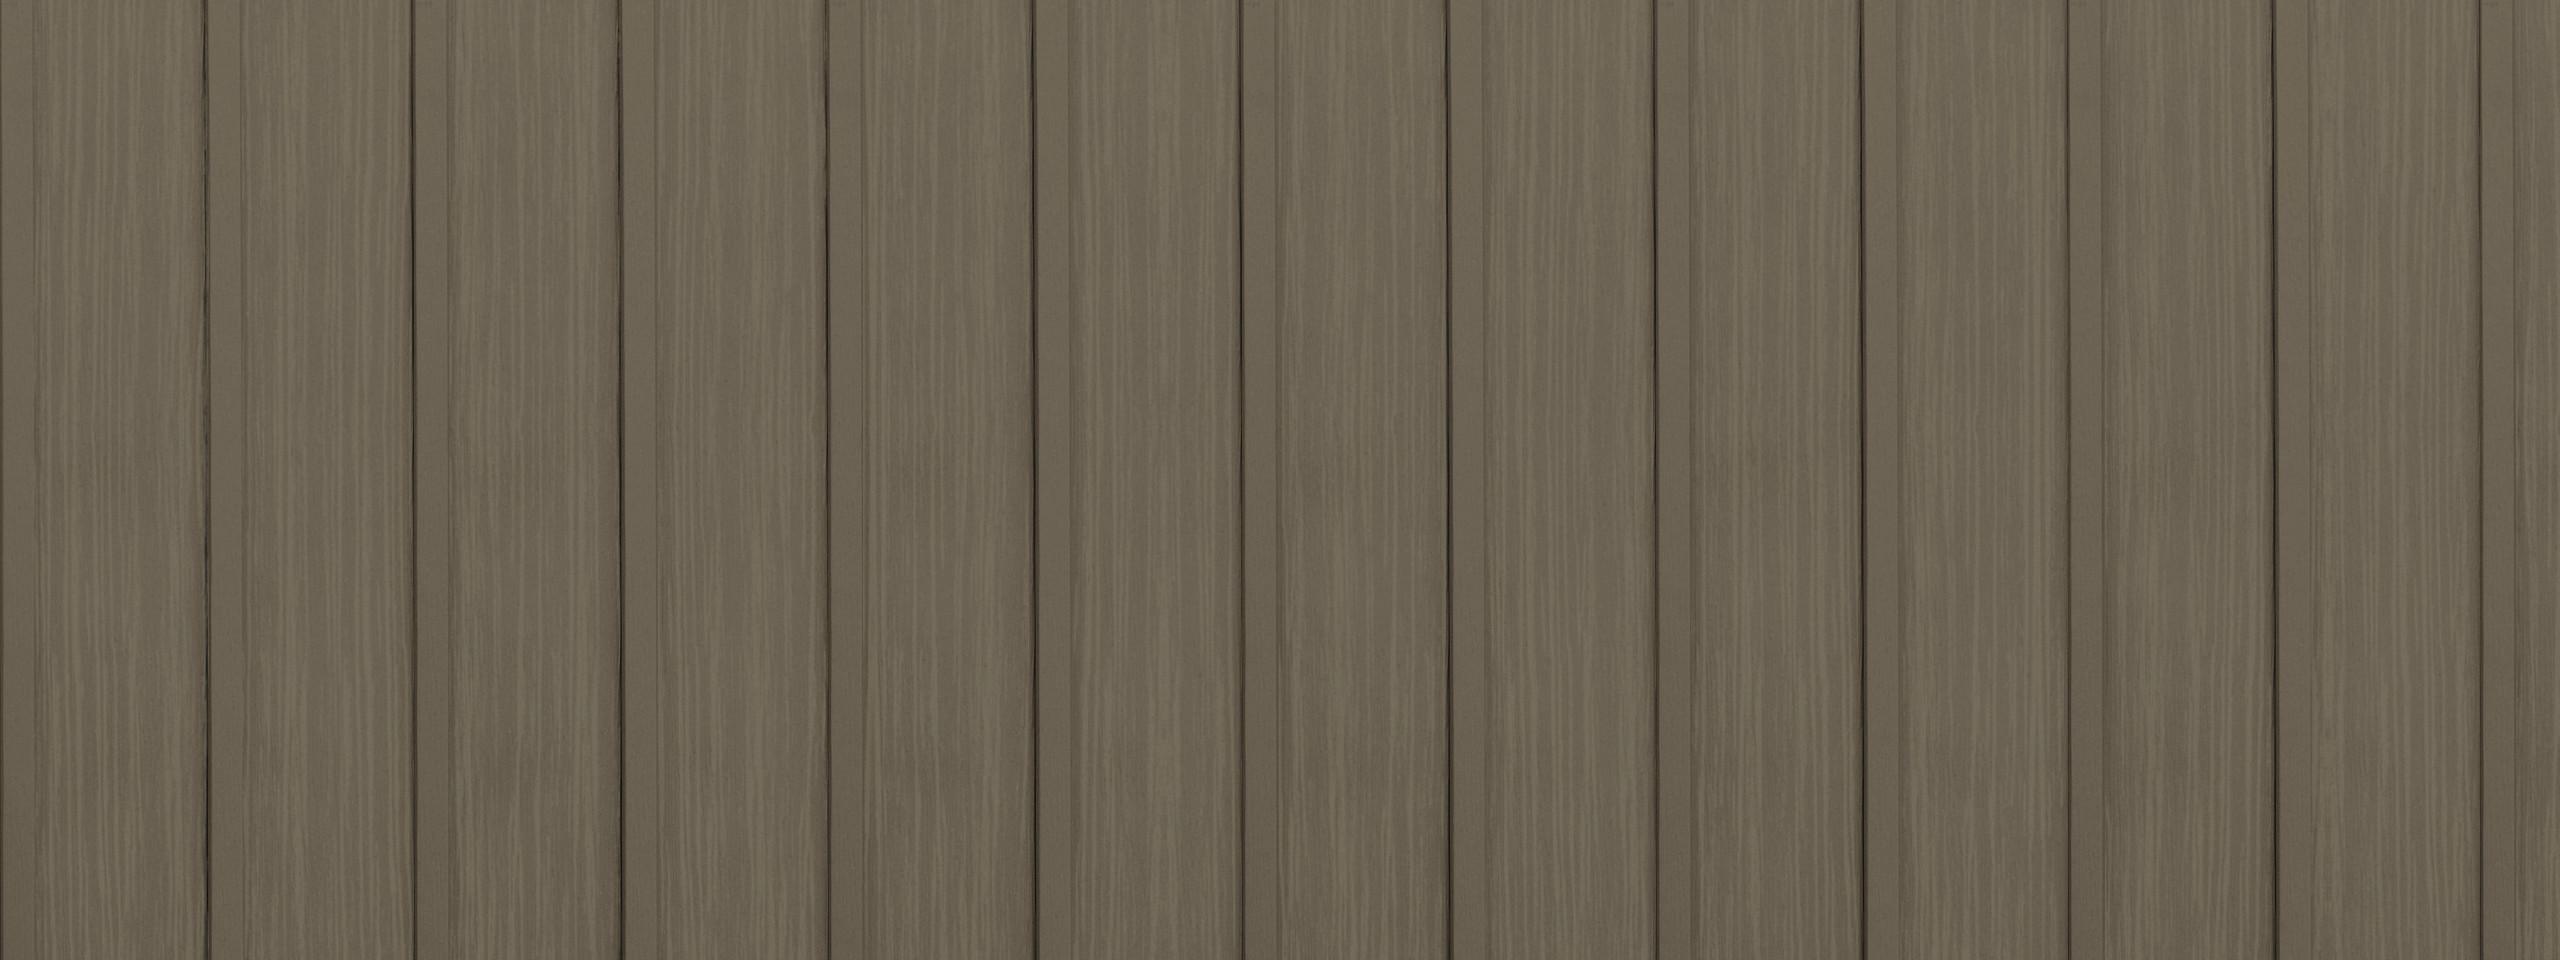 Entex vertical canyon hd board and batten steel siding